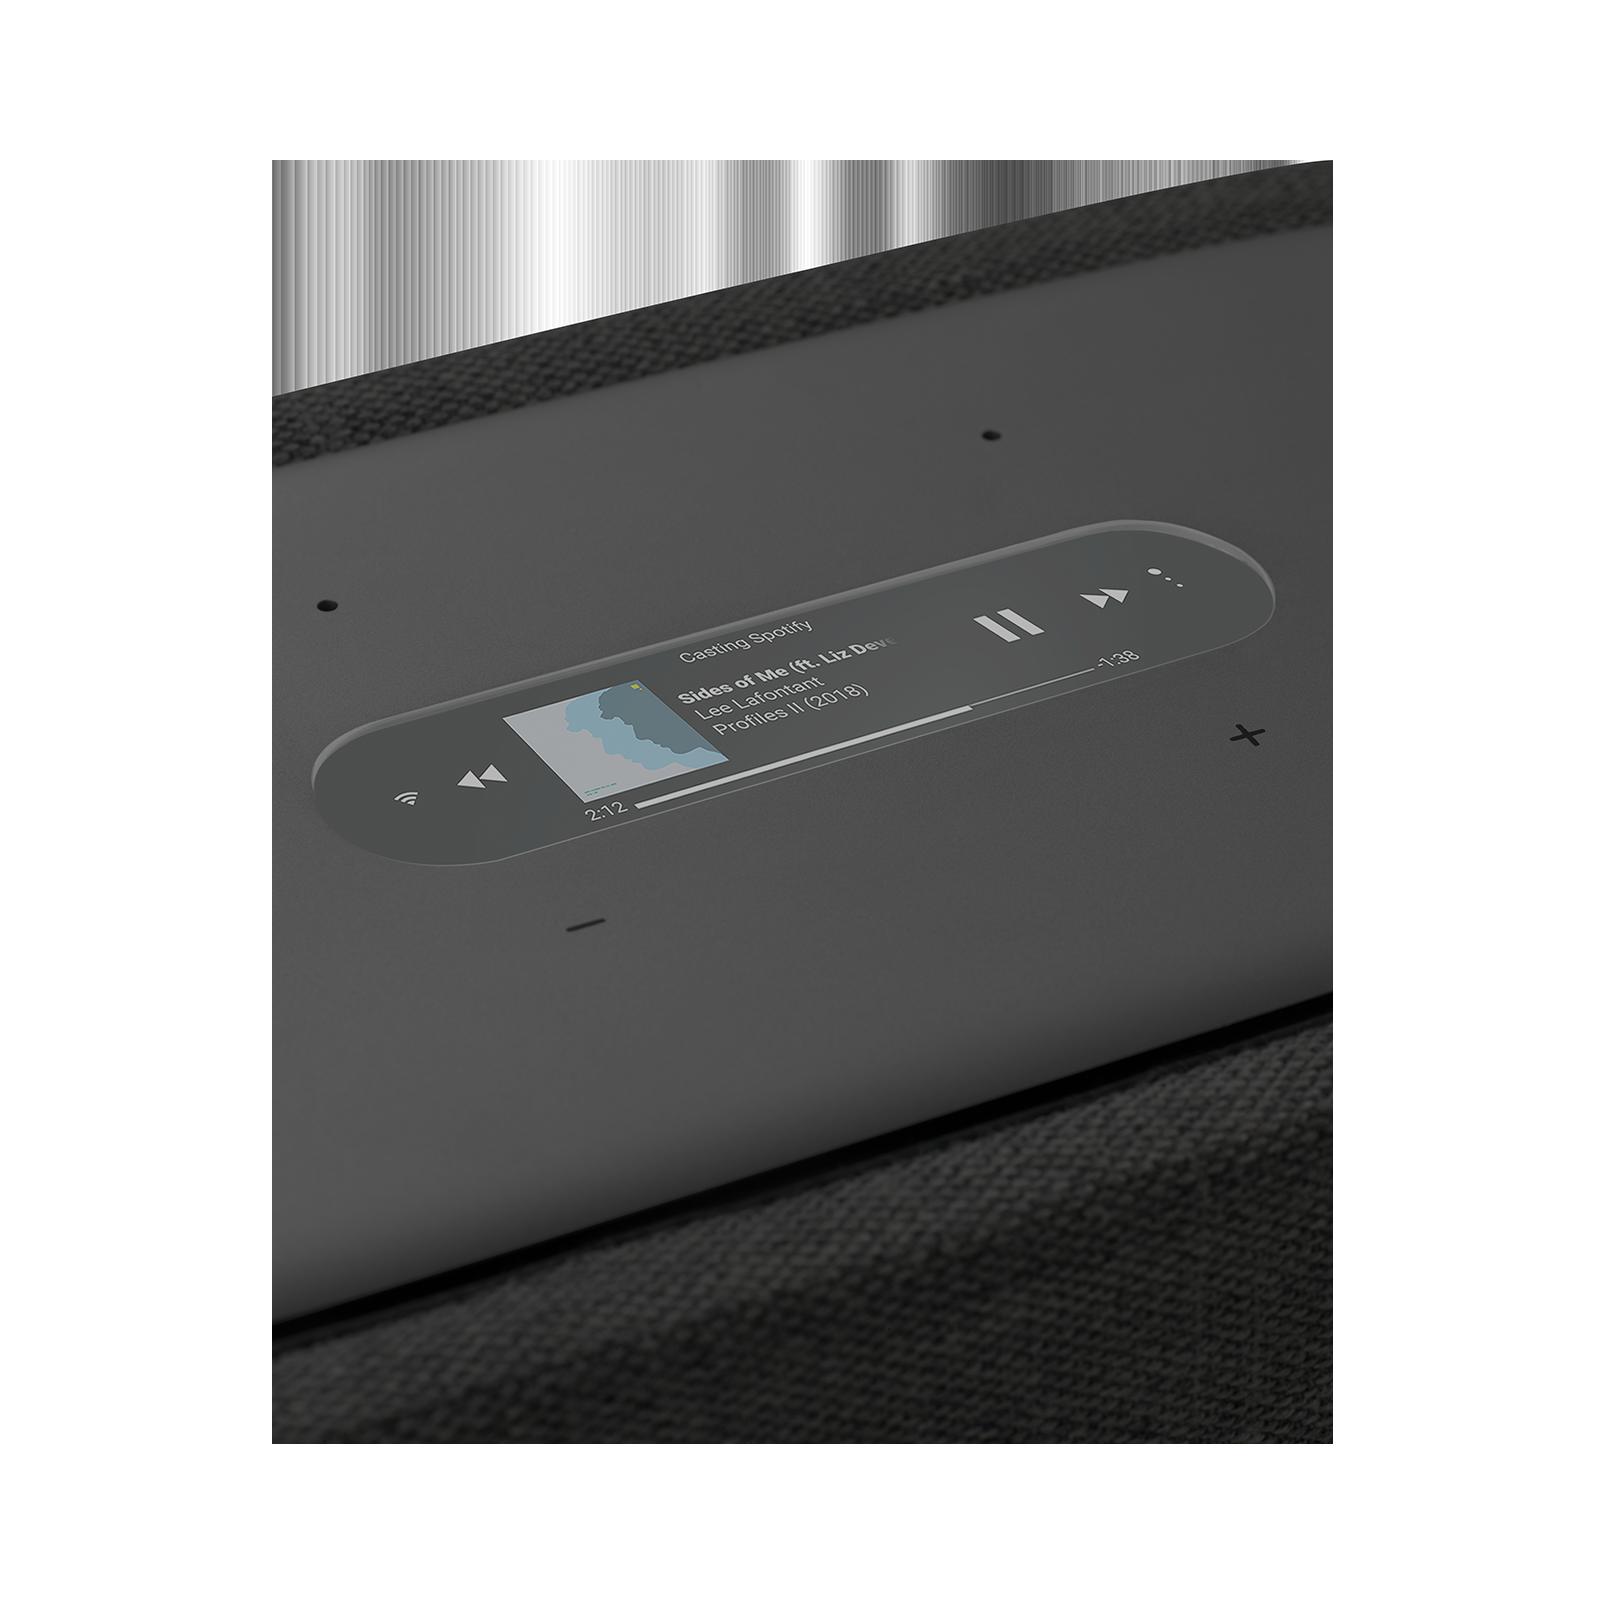 Harman Kardon Citation 300 - Black - The medium-size smart home speaker with award winning design - Detailshot 1